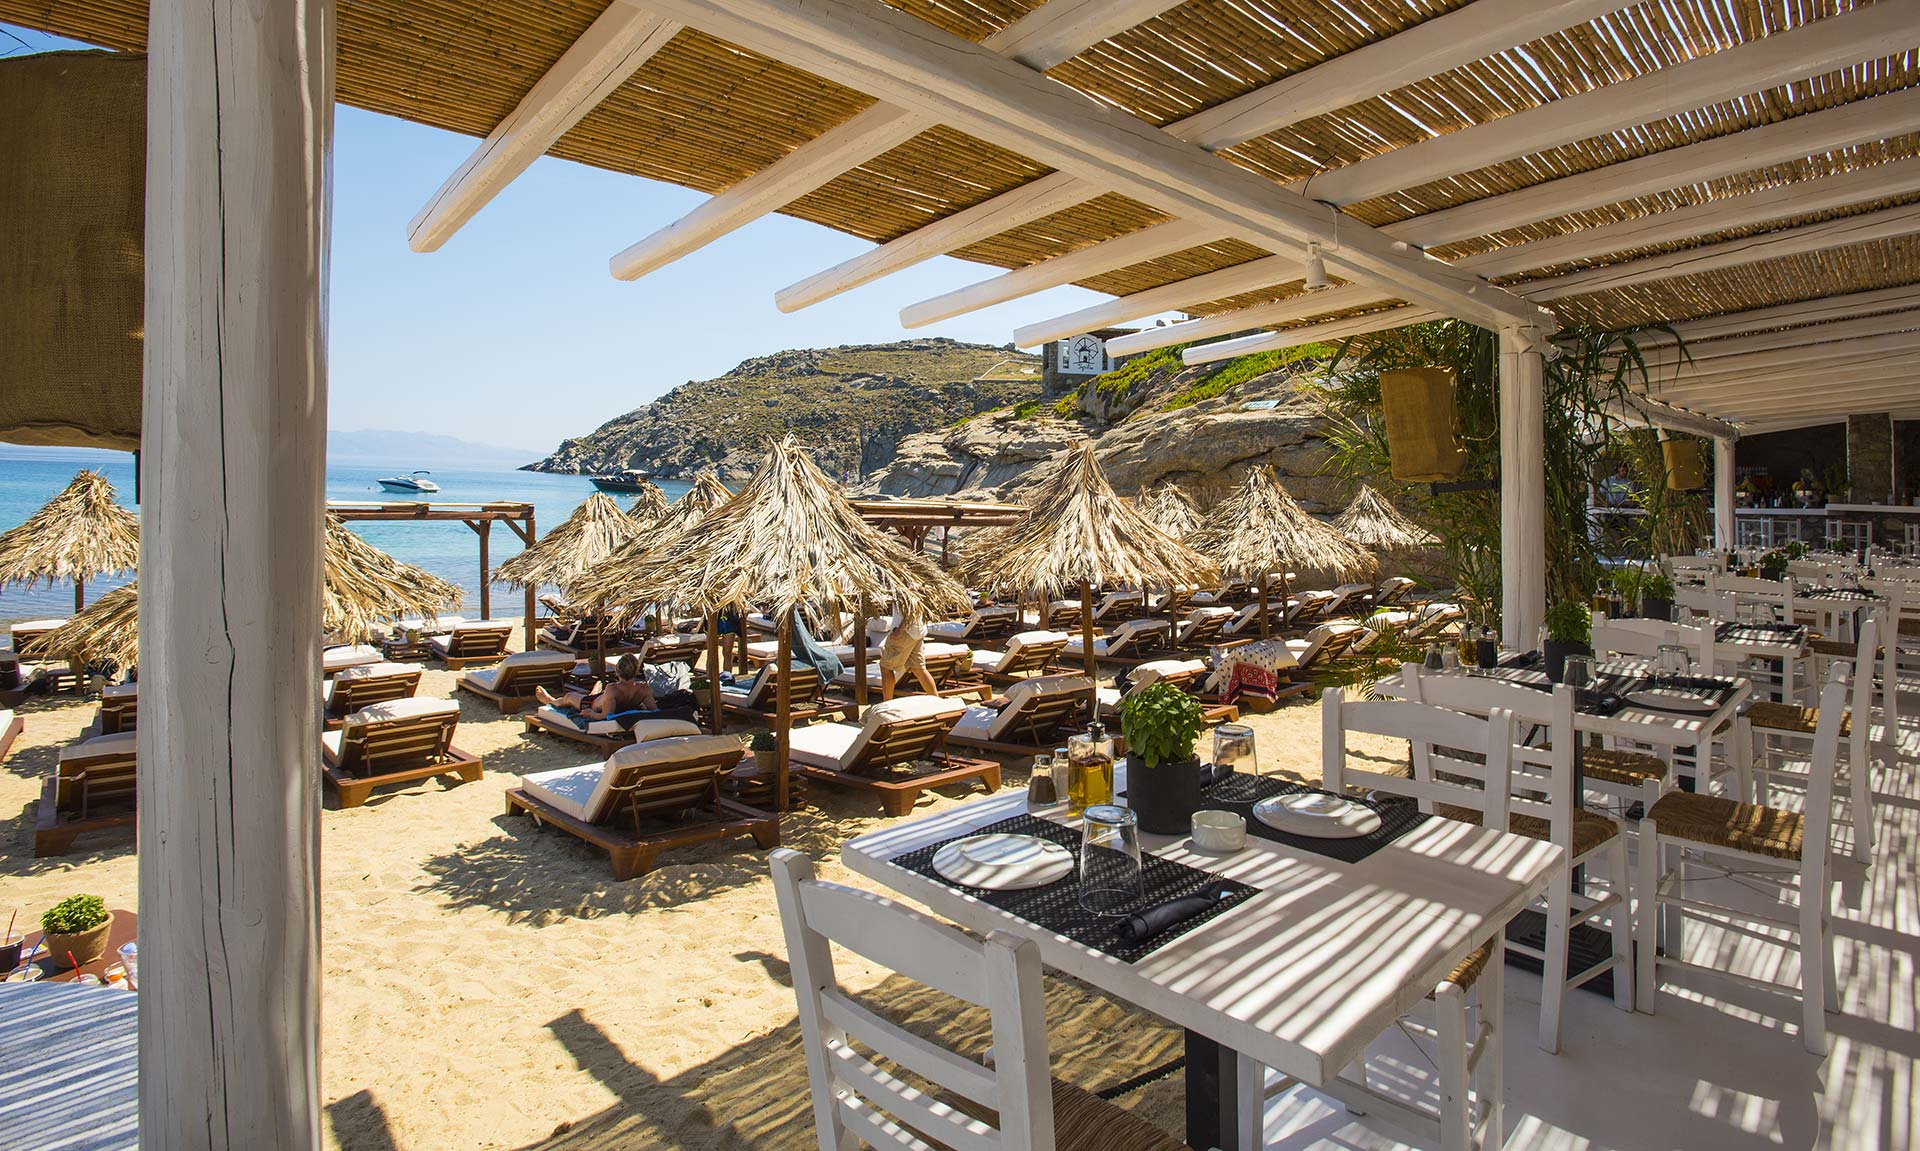 The Beach Bar & Restaurant